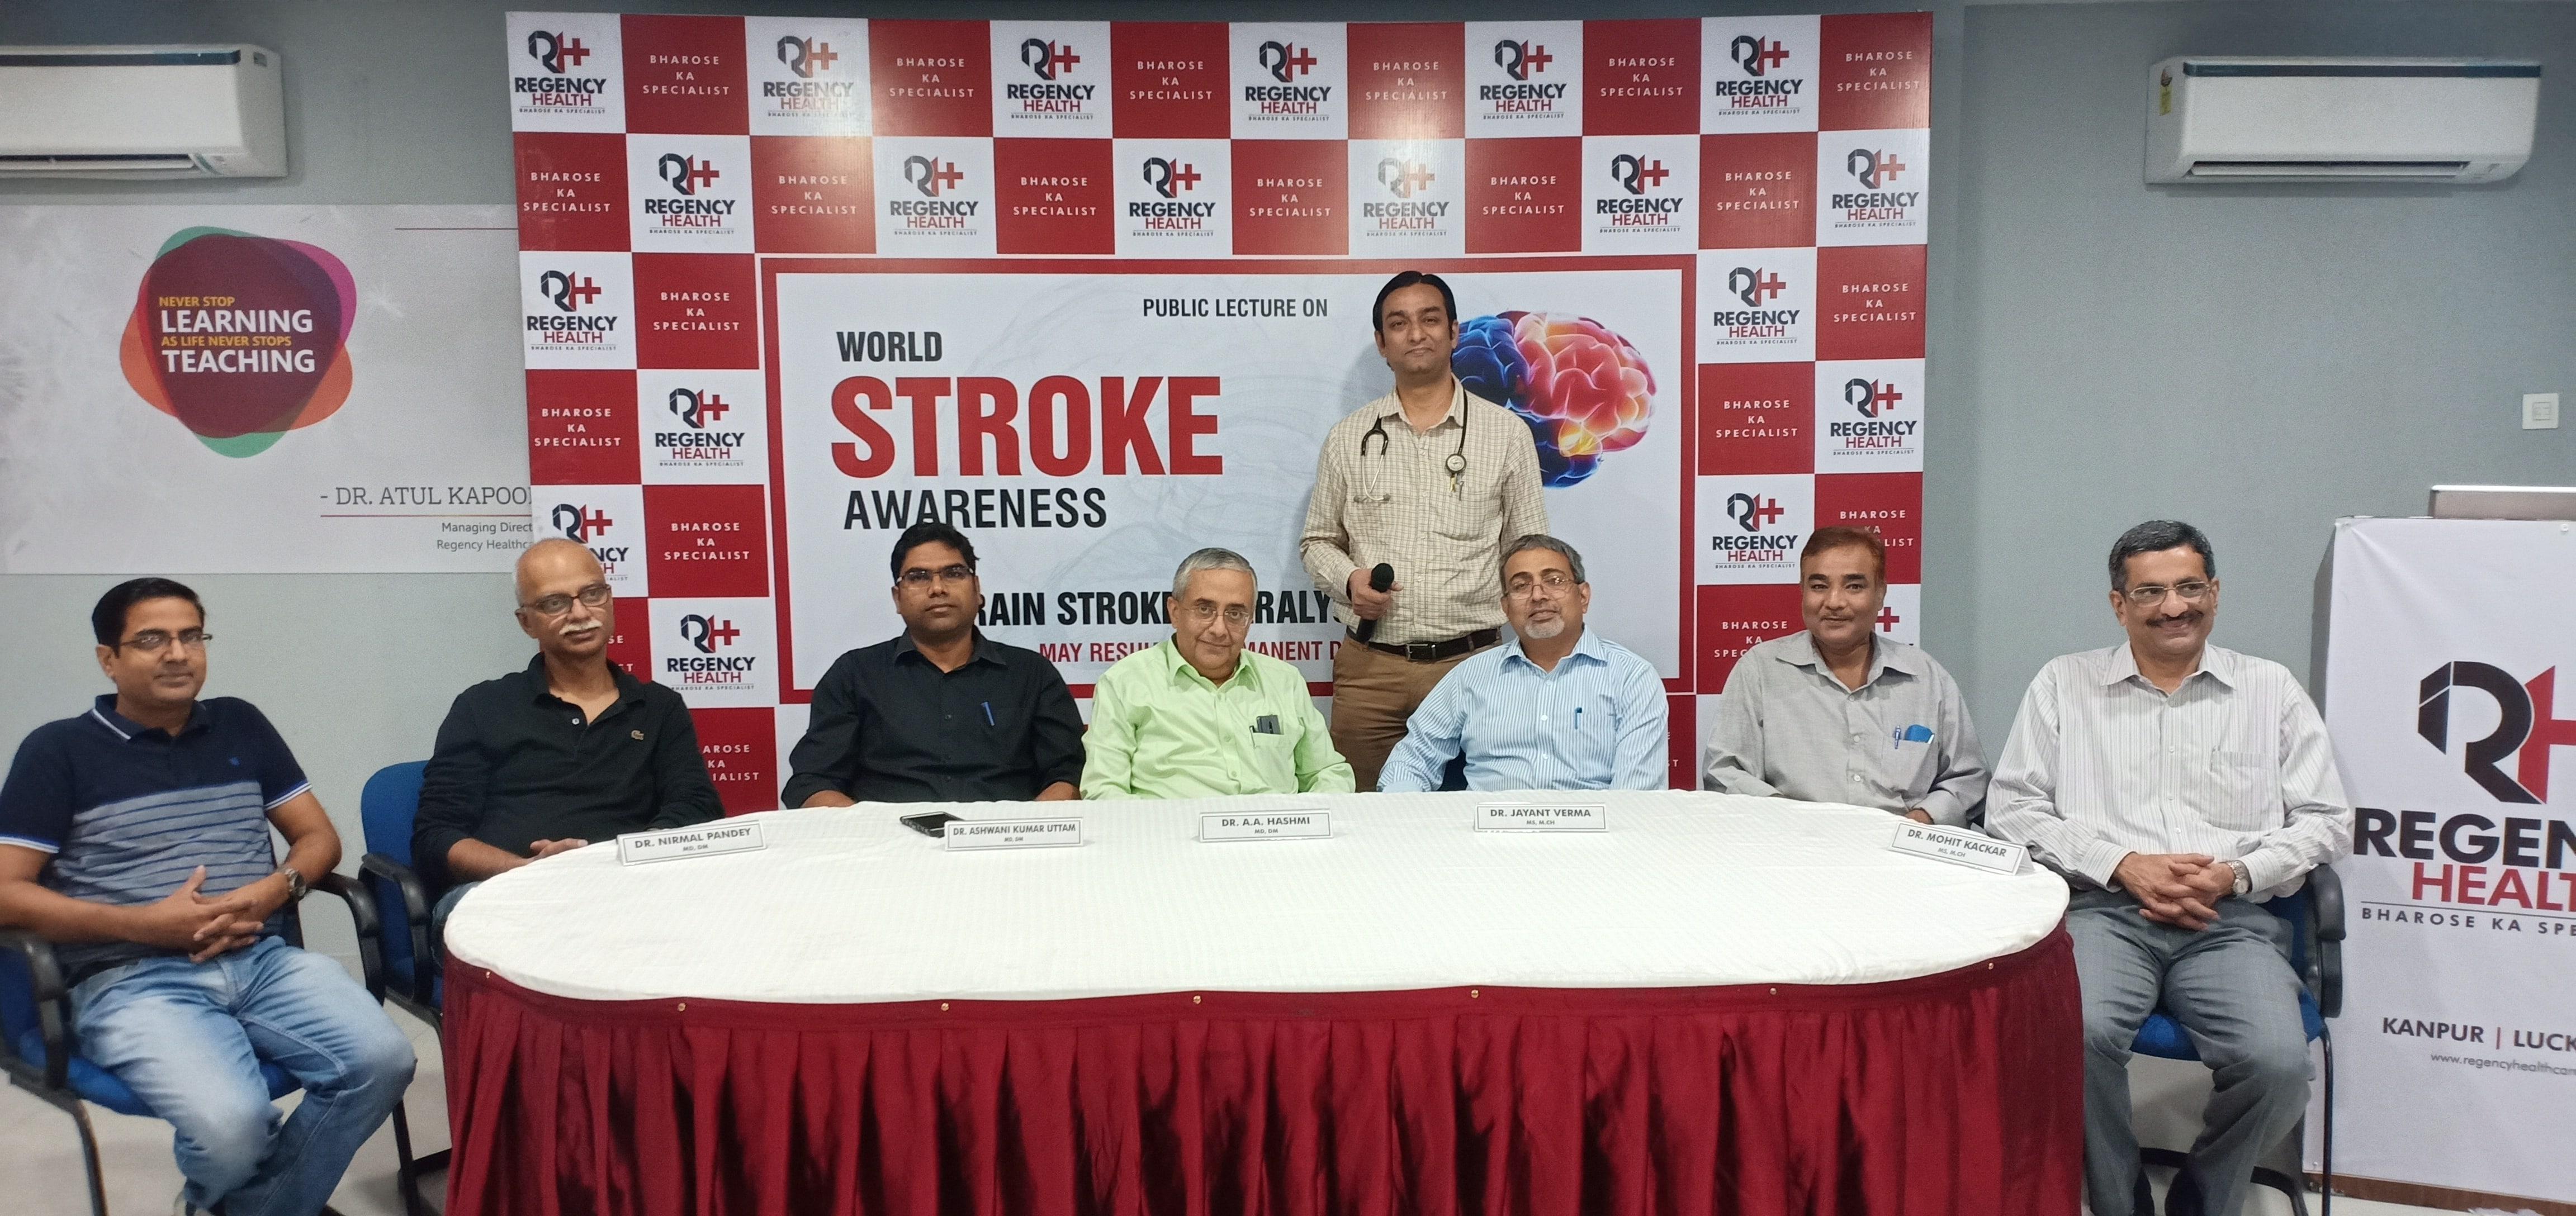 Stroke Awareness program 2019